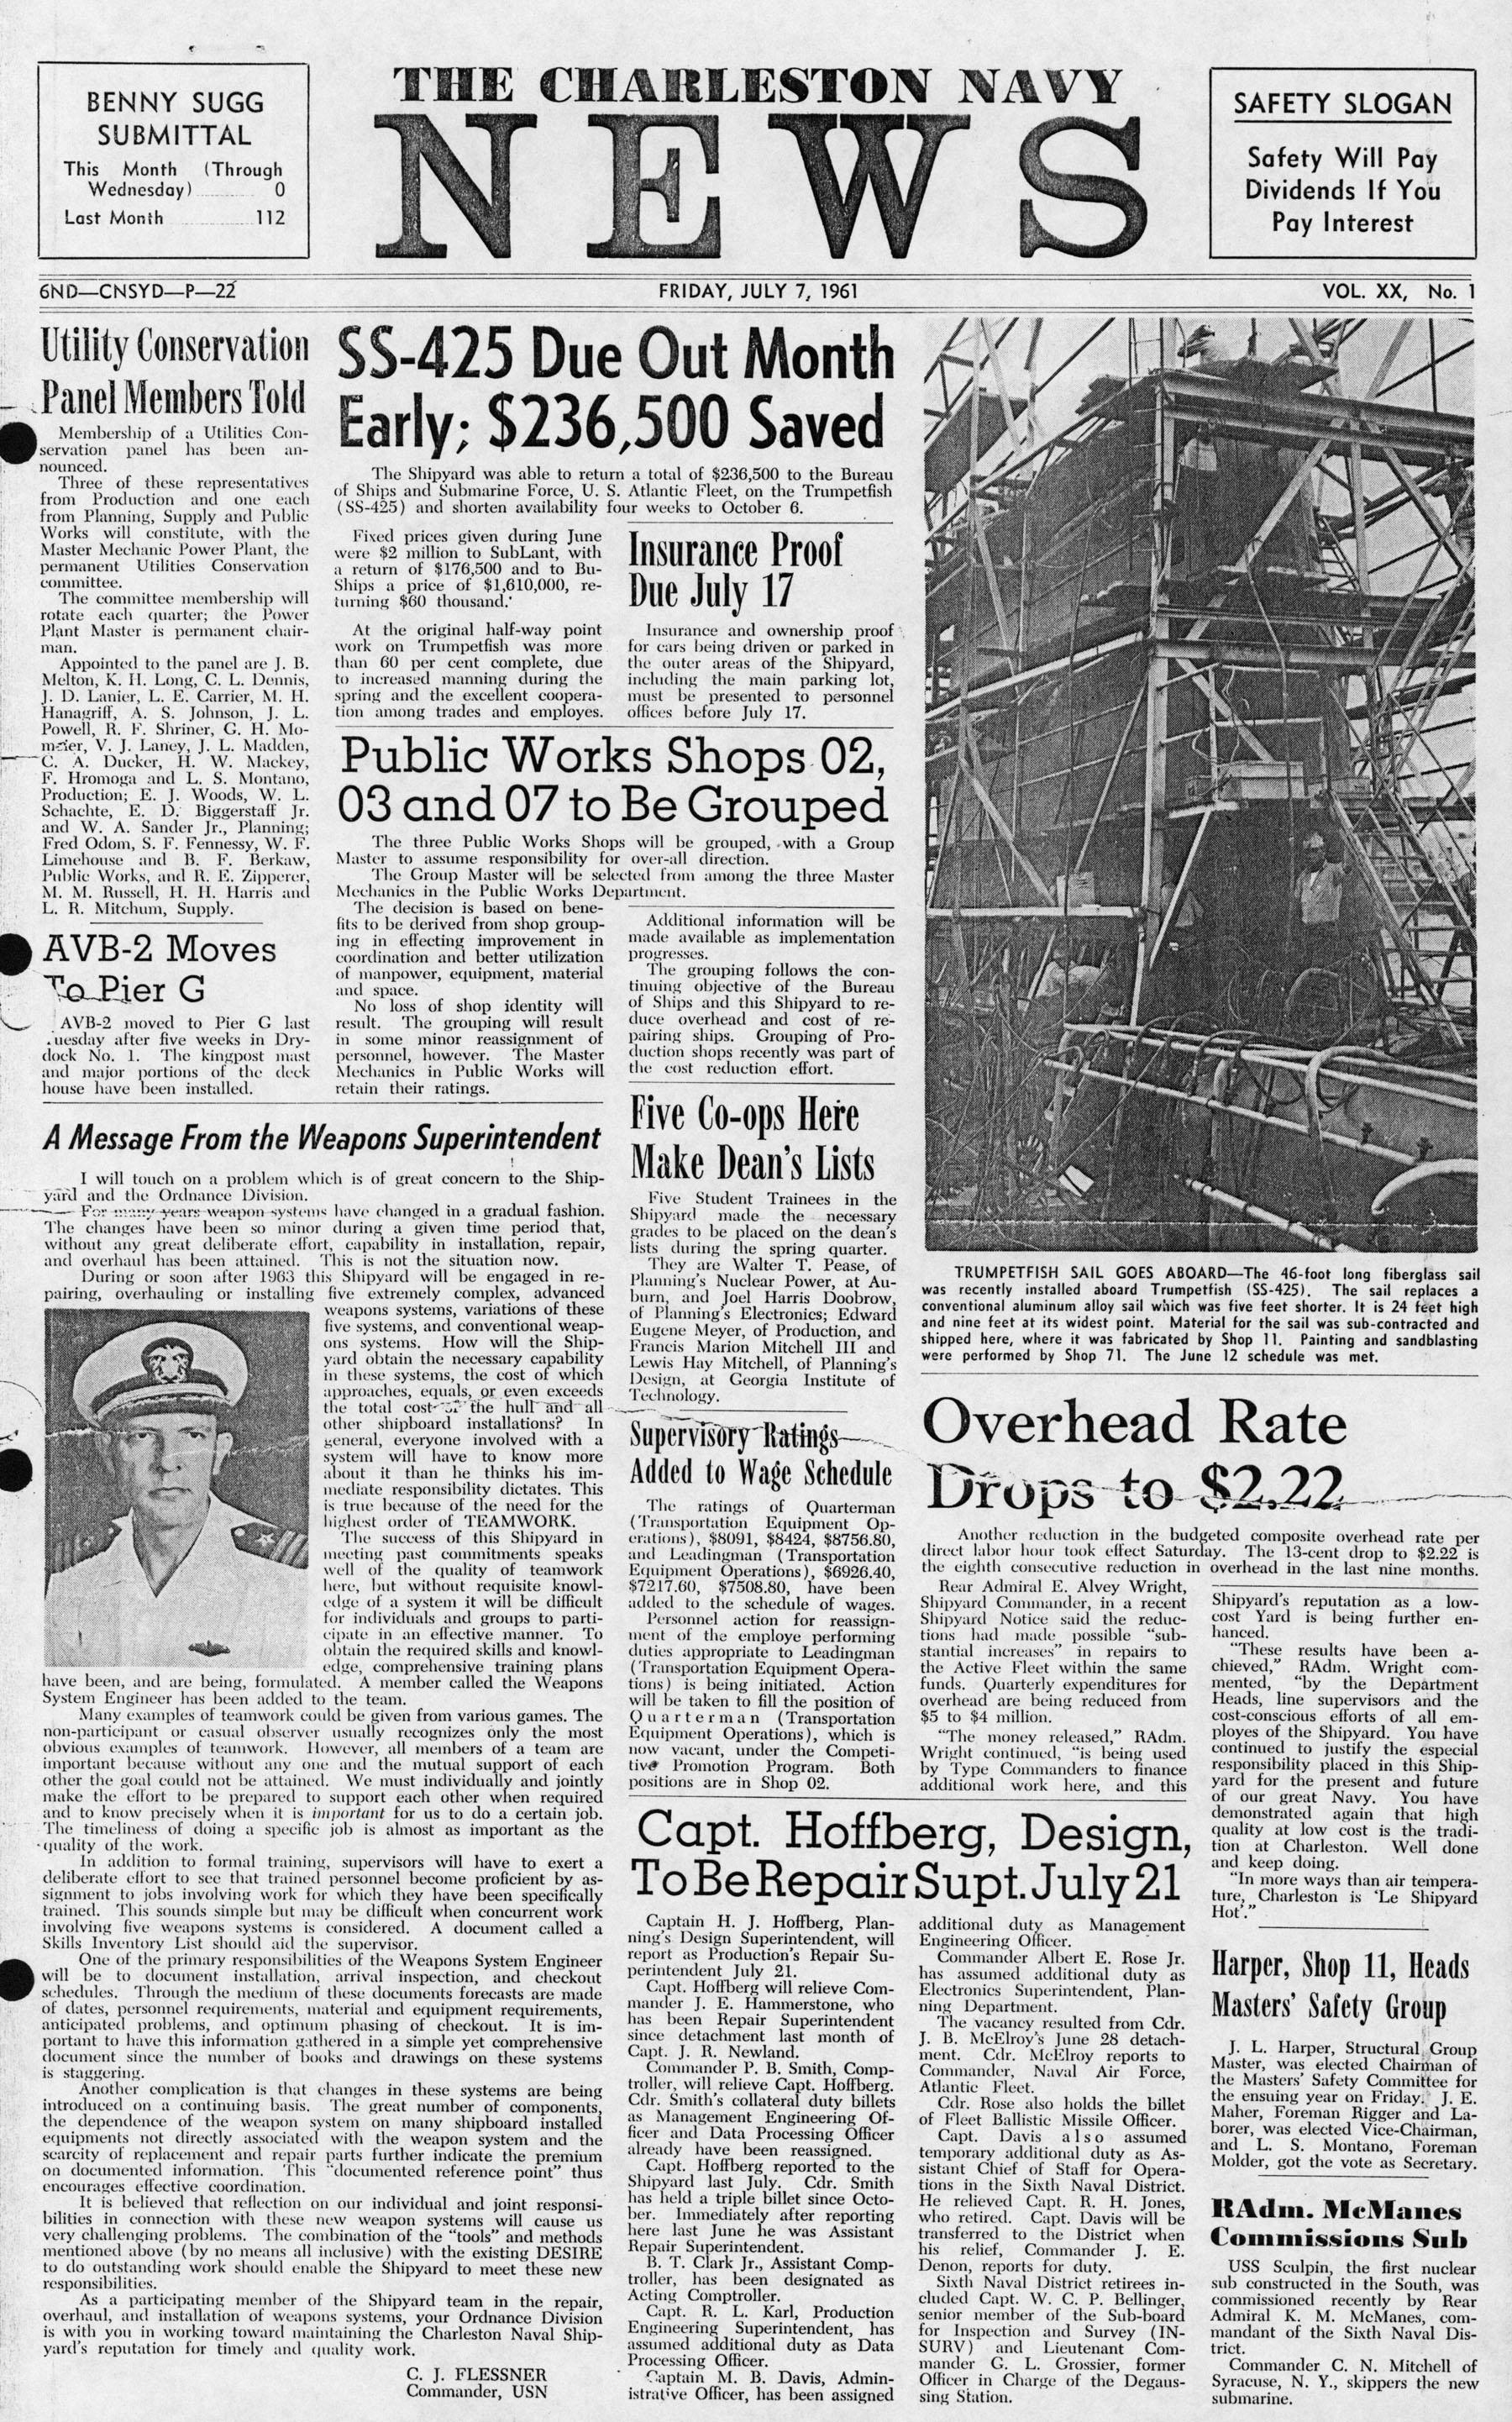 The Charleston Navy News, Volume 20, Edition 1, page i